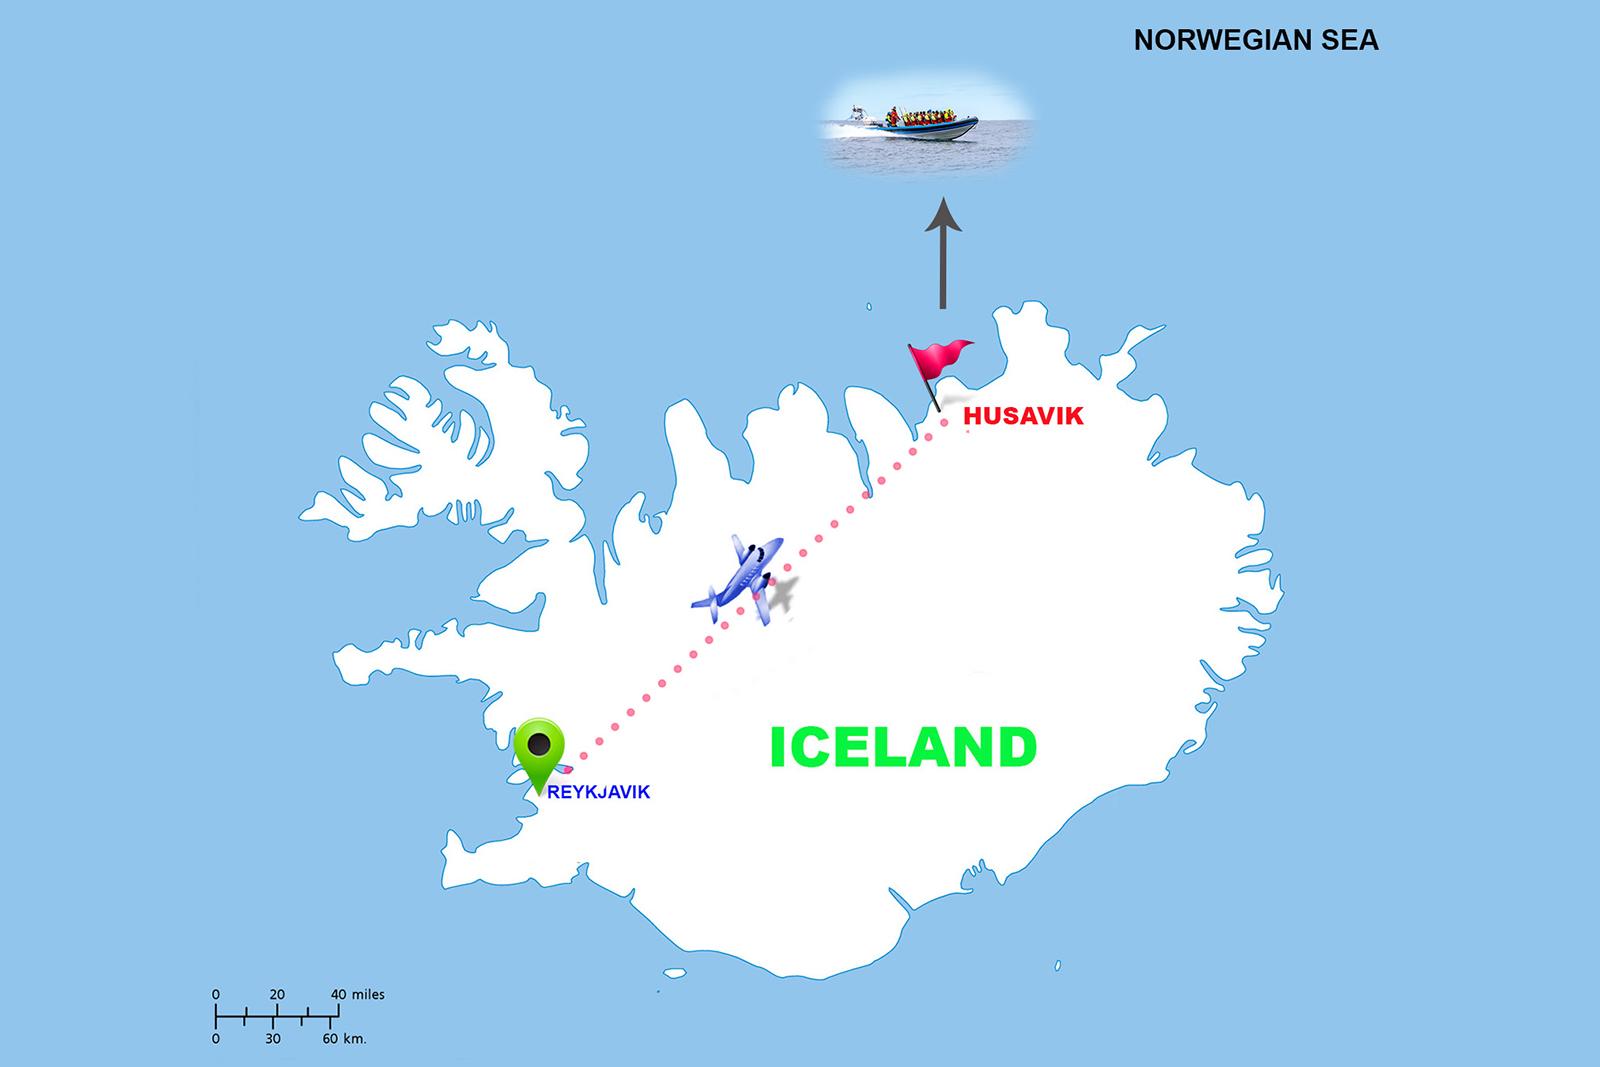 0. ICELAND MAP